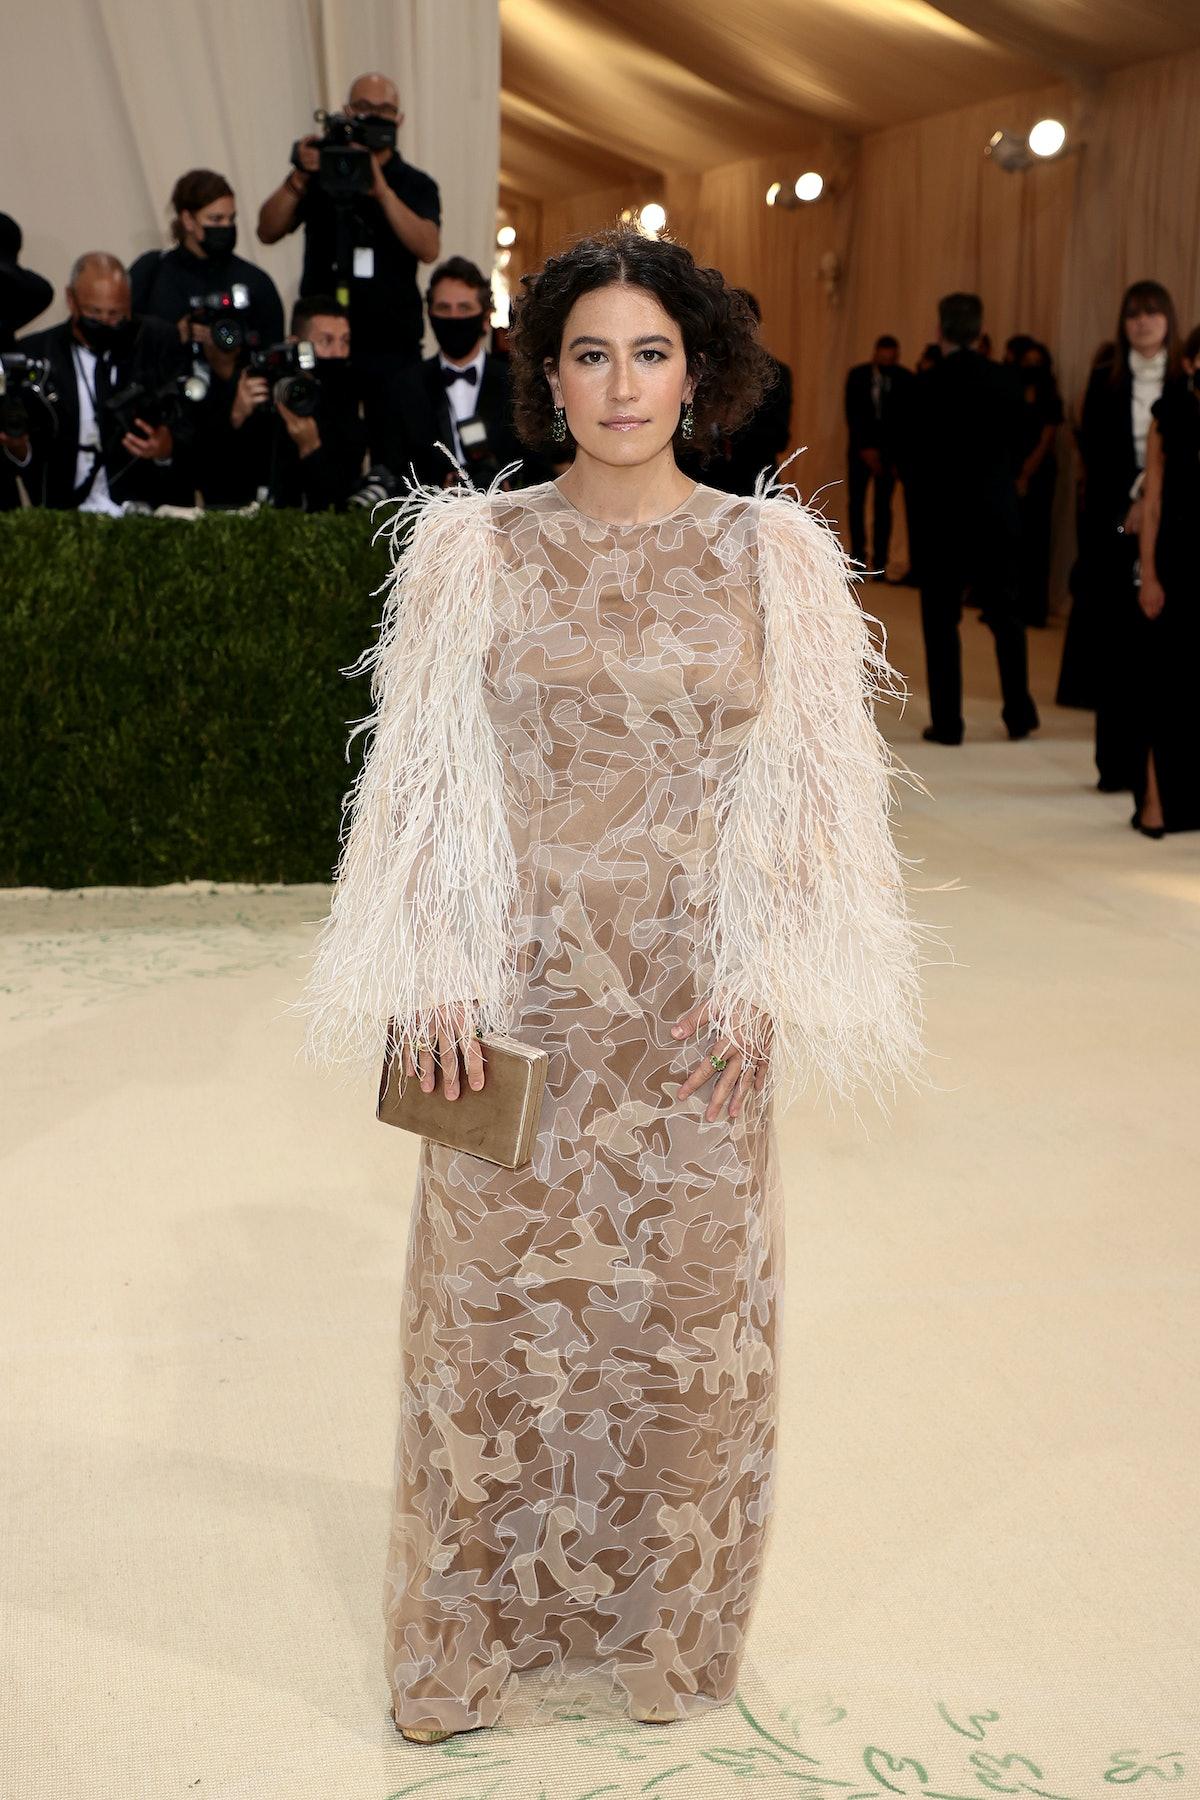 Ilana Glazer attends The 2021 Met Gala Celebrating In America: A Lexicon Of Fashion at Metropolitan...